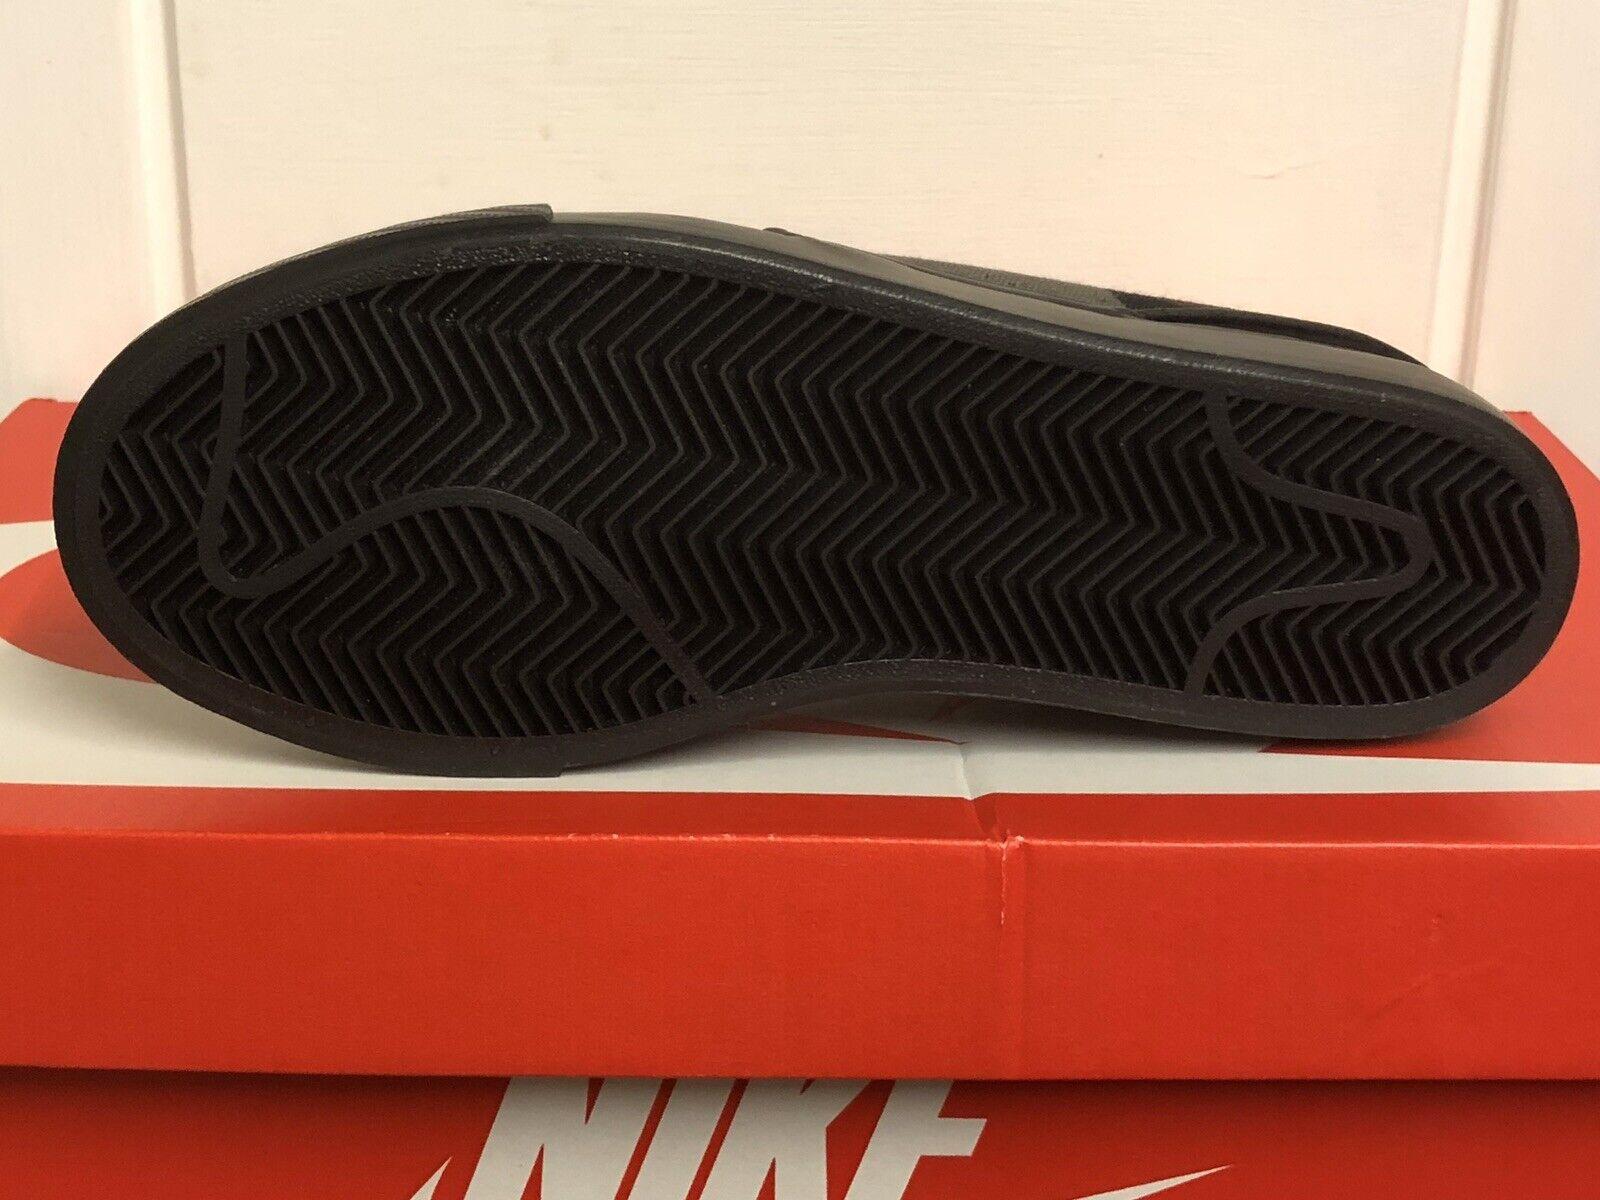 NIKE SB STEFAN JANOSKI OG TRAINERS Mens shoes Sneakers UK UK UK 5,5 EUR 38,5 US 6 Camo 6147aa